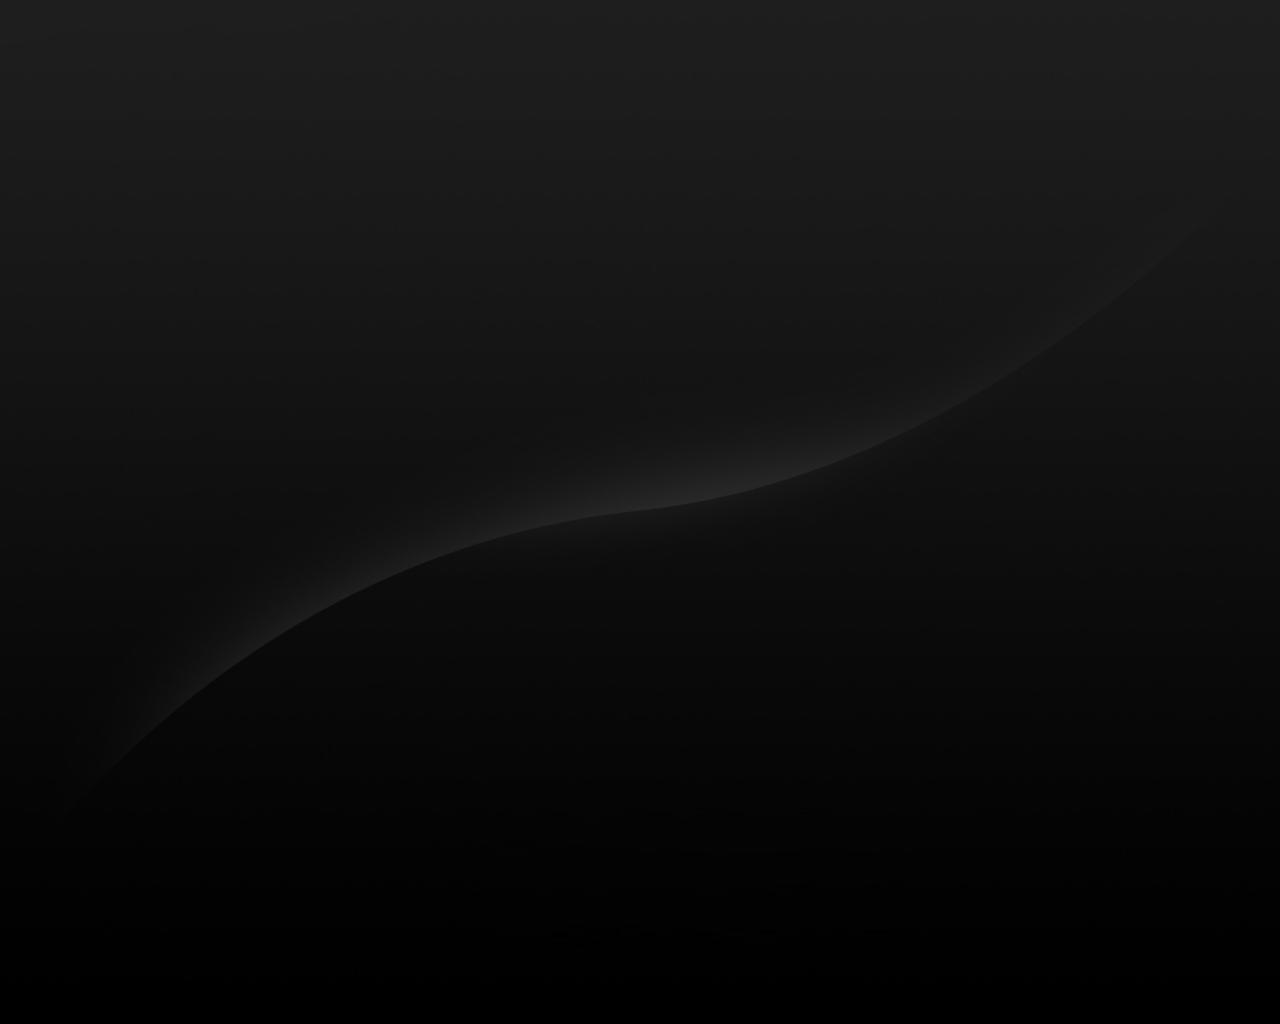 Black Wallpapers Cool | Free Download Wallpaper | DaWallpaperz